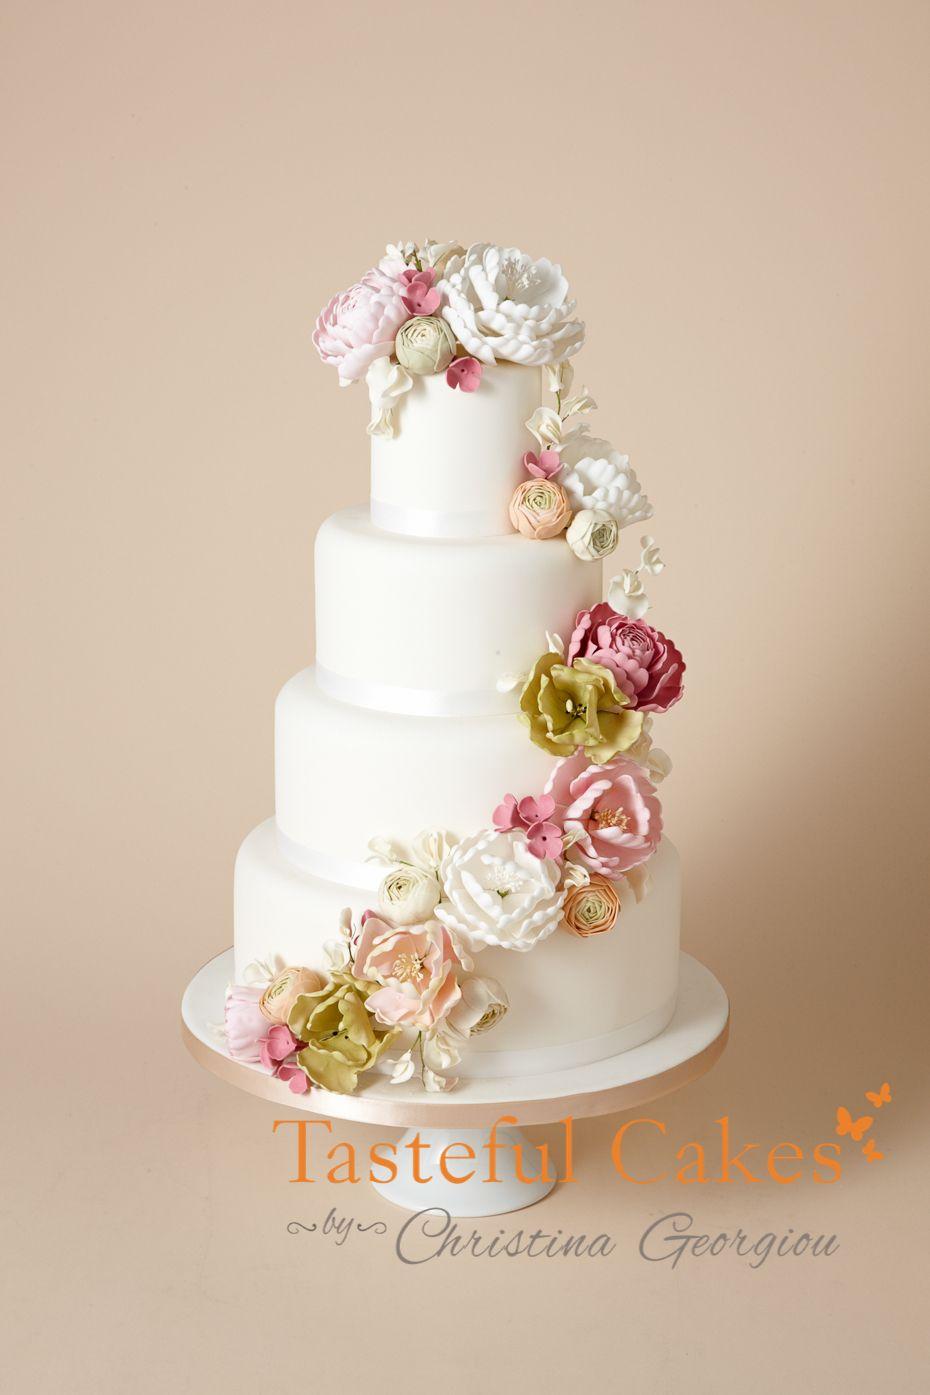 Pin by Vanda Desiree on ◇◇Wedding Cakes◇◇ | Pinterest ...